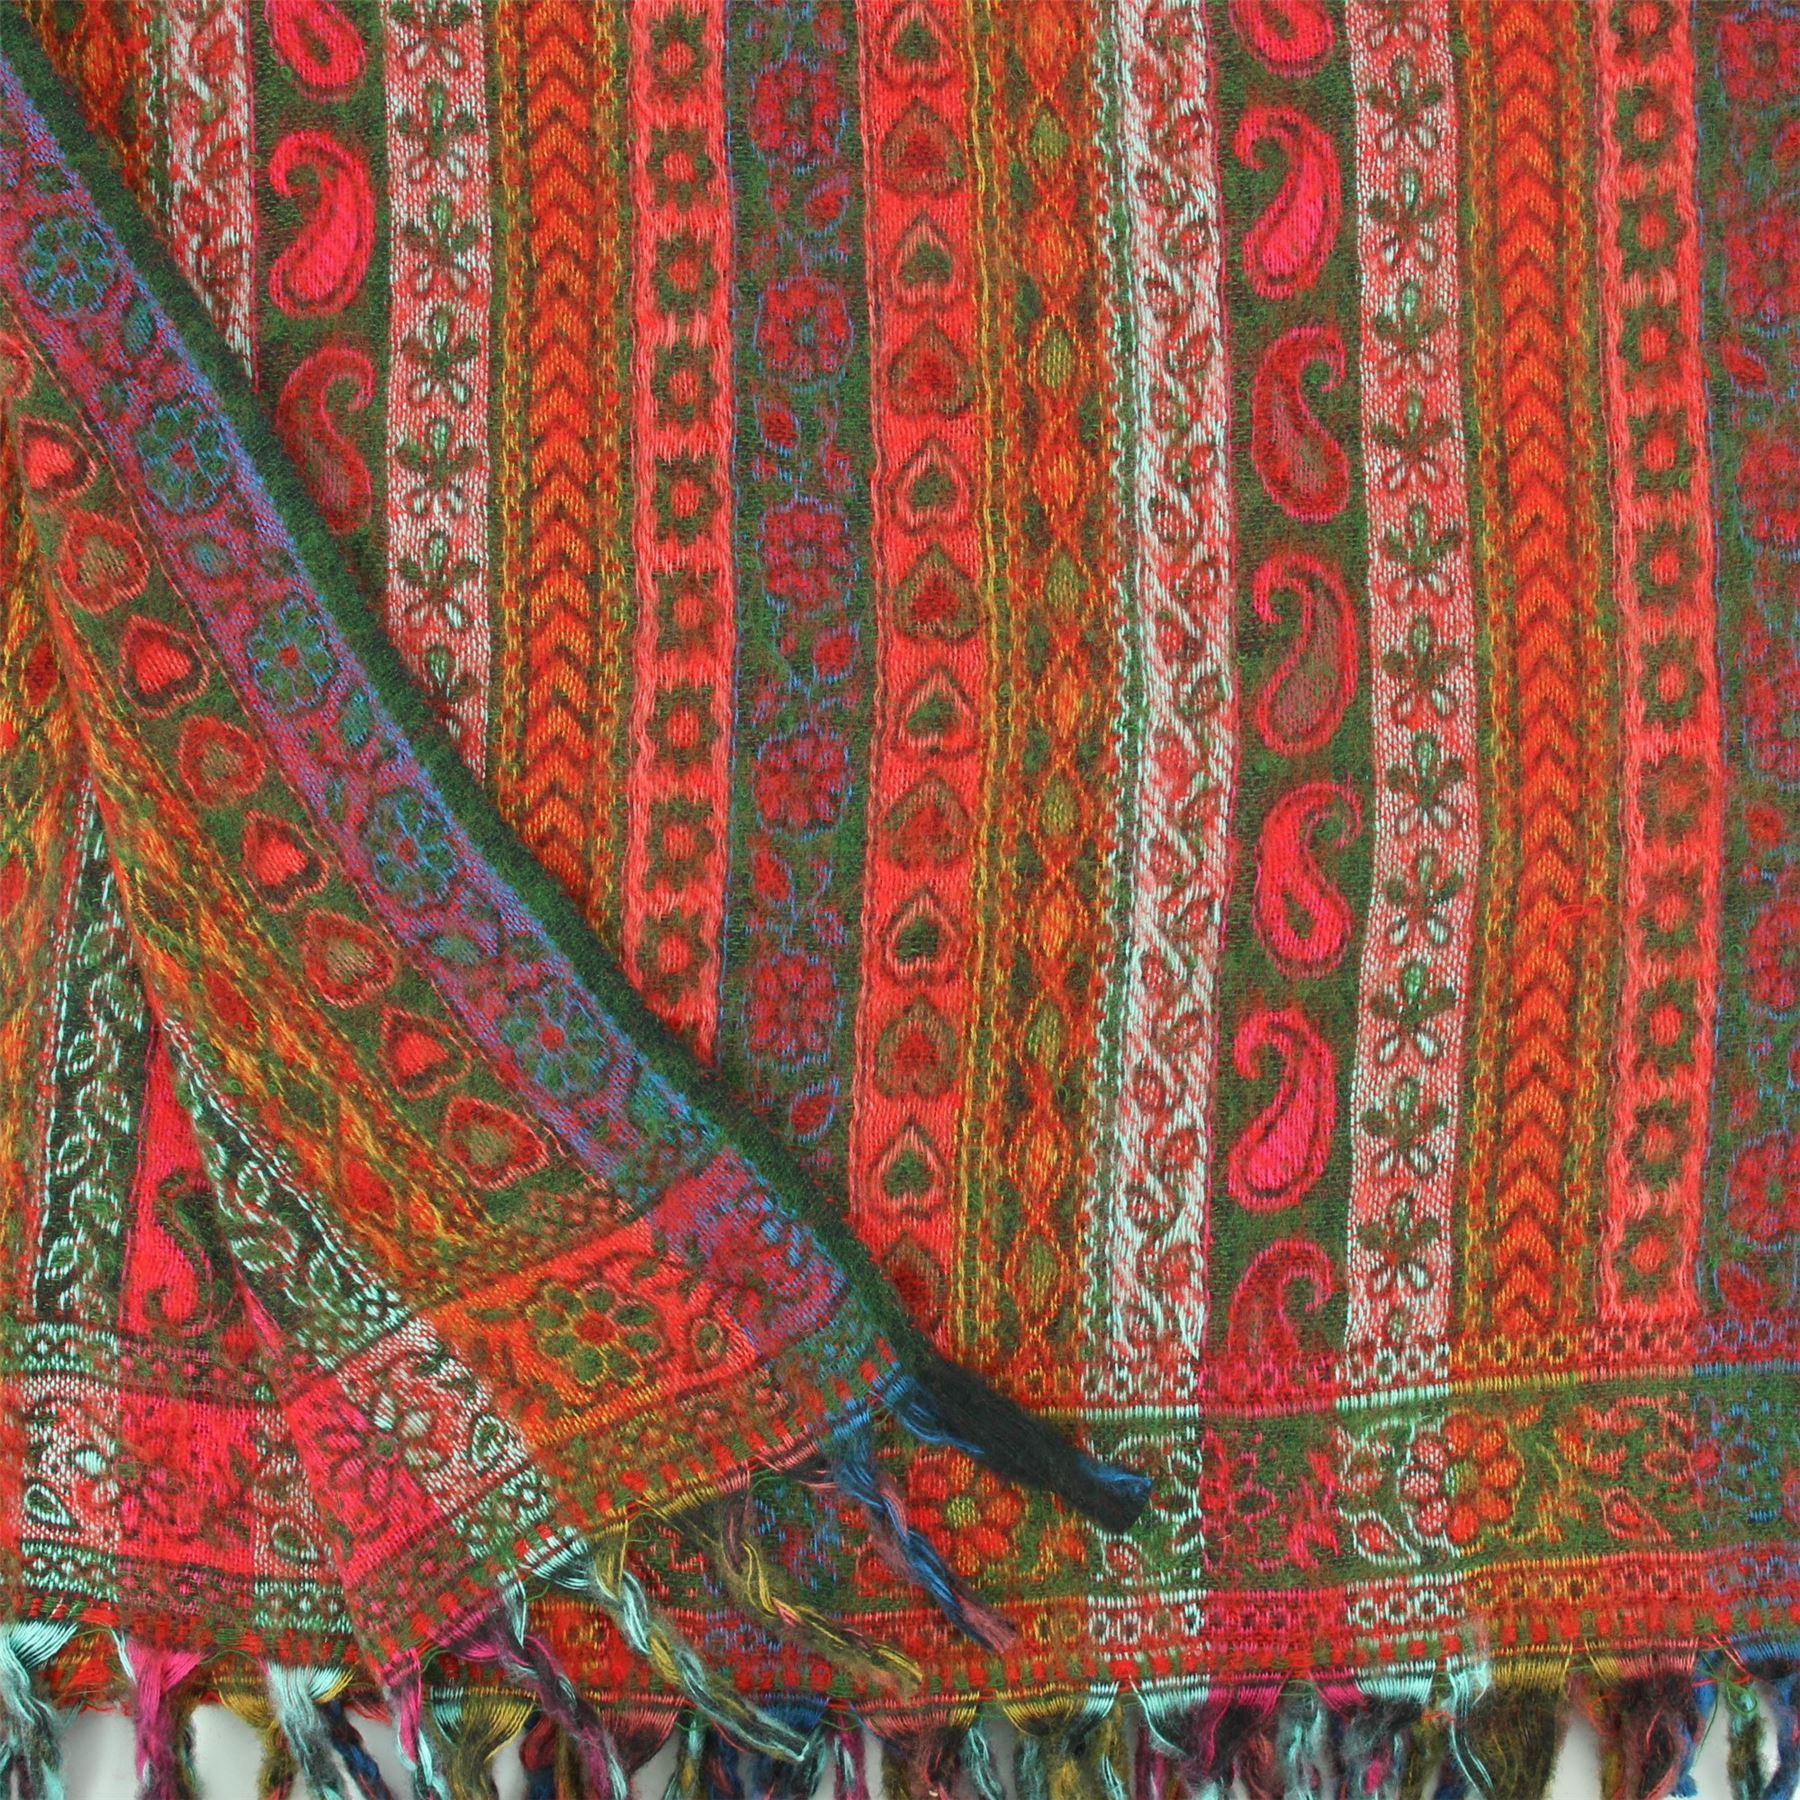 Acrylic-Wool-Blanket-Shawl-Wrap-Throw-Finest-Softest-India-Stripe-Paisley-Travel thumbnail 42